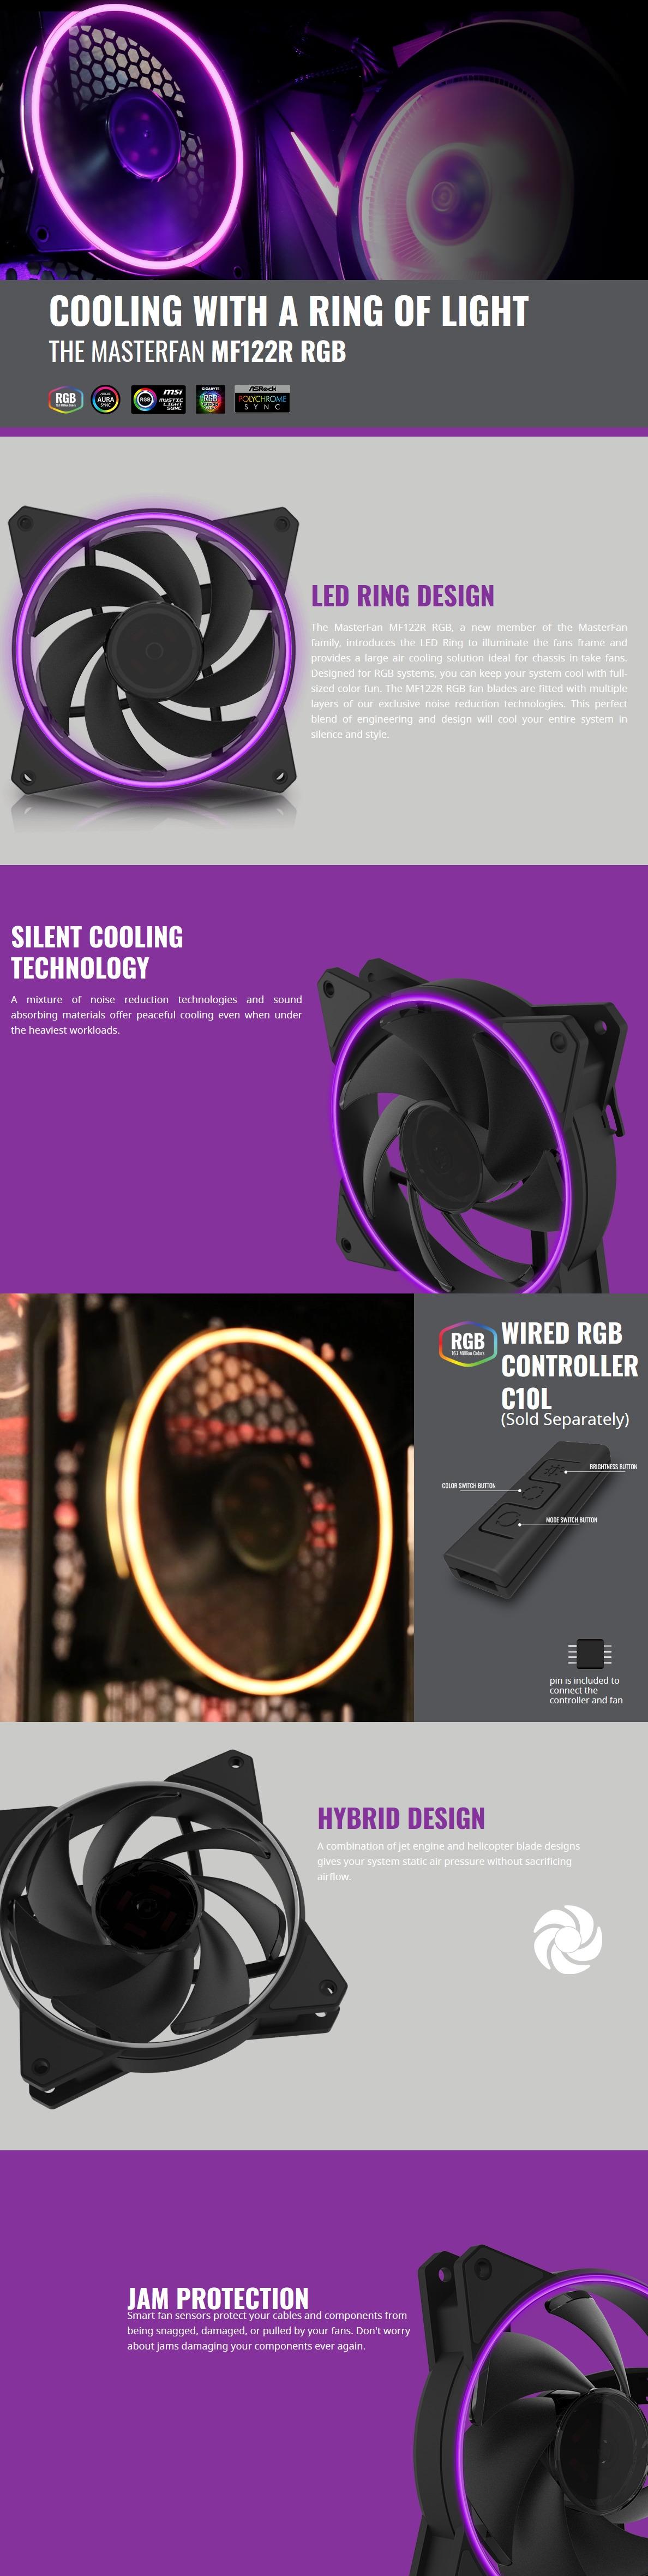 Cooler Master MasterFan MF122R RGB 120MM - Single Pack